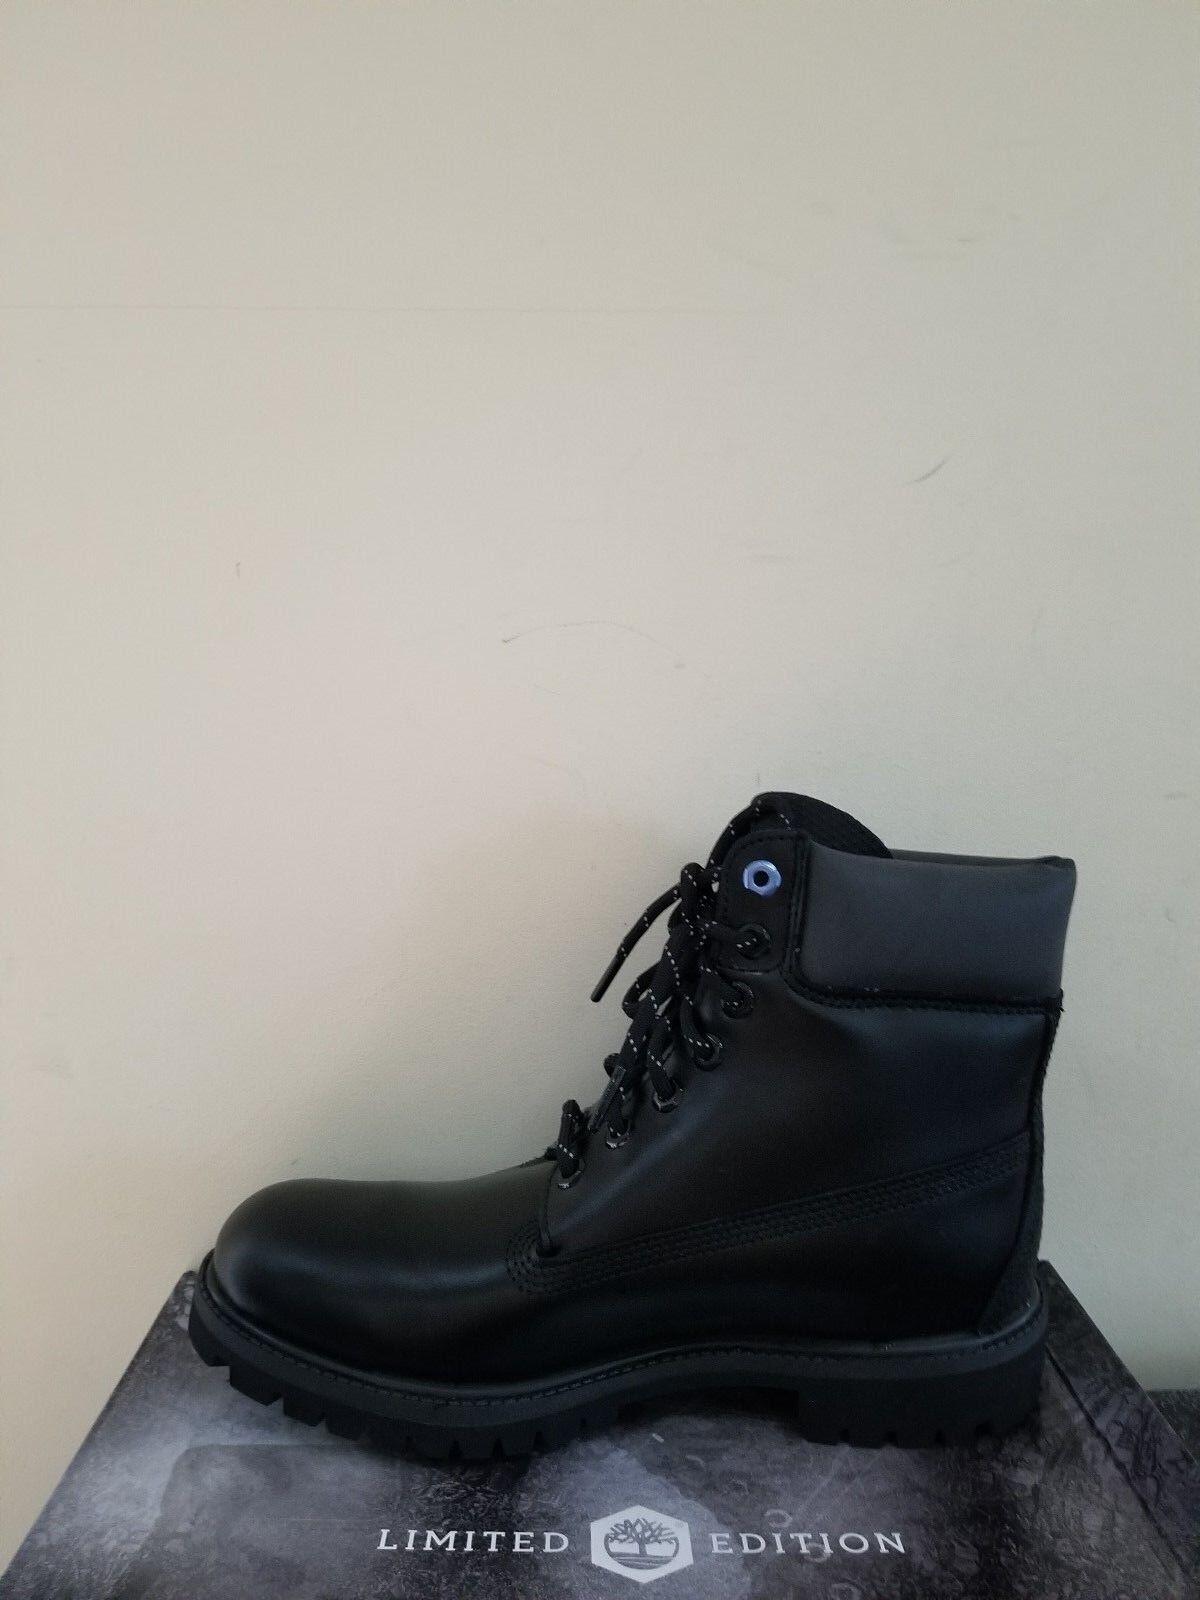 Timberland Women's Black Ice 6-Inch Premium Waterproof Boots Limited Edition NIB 1